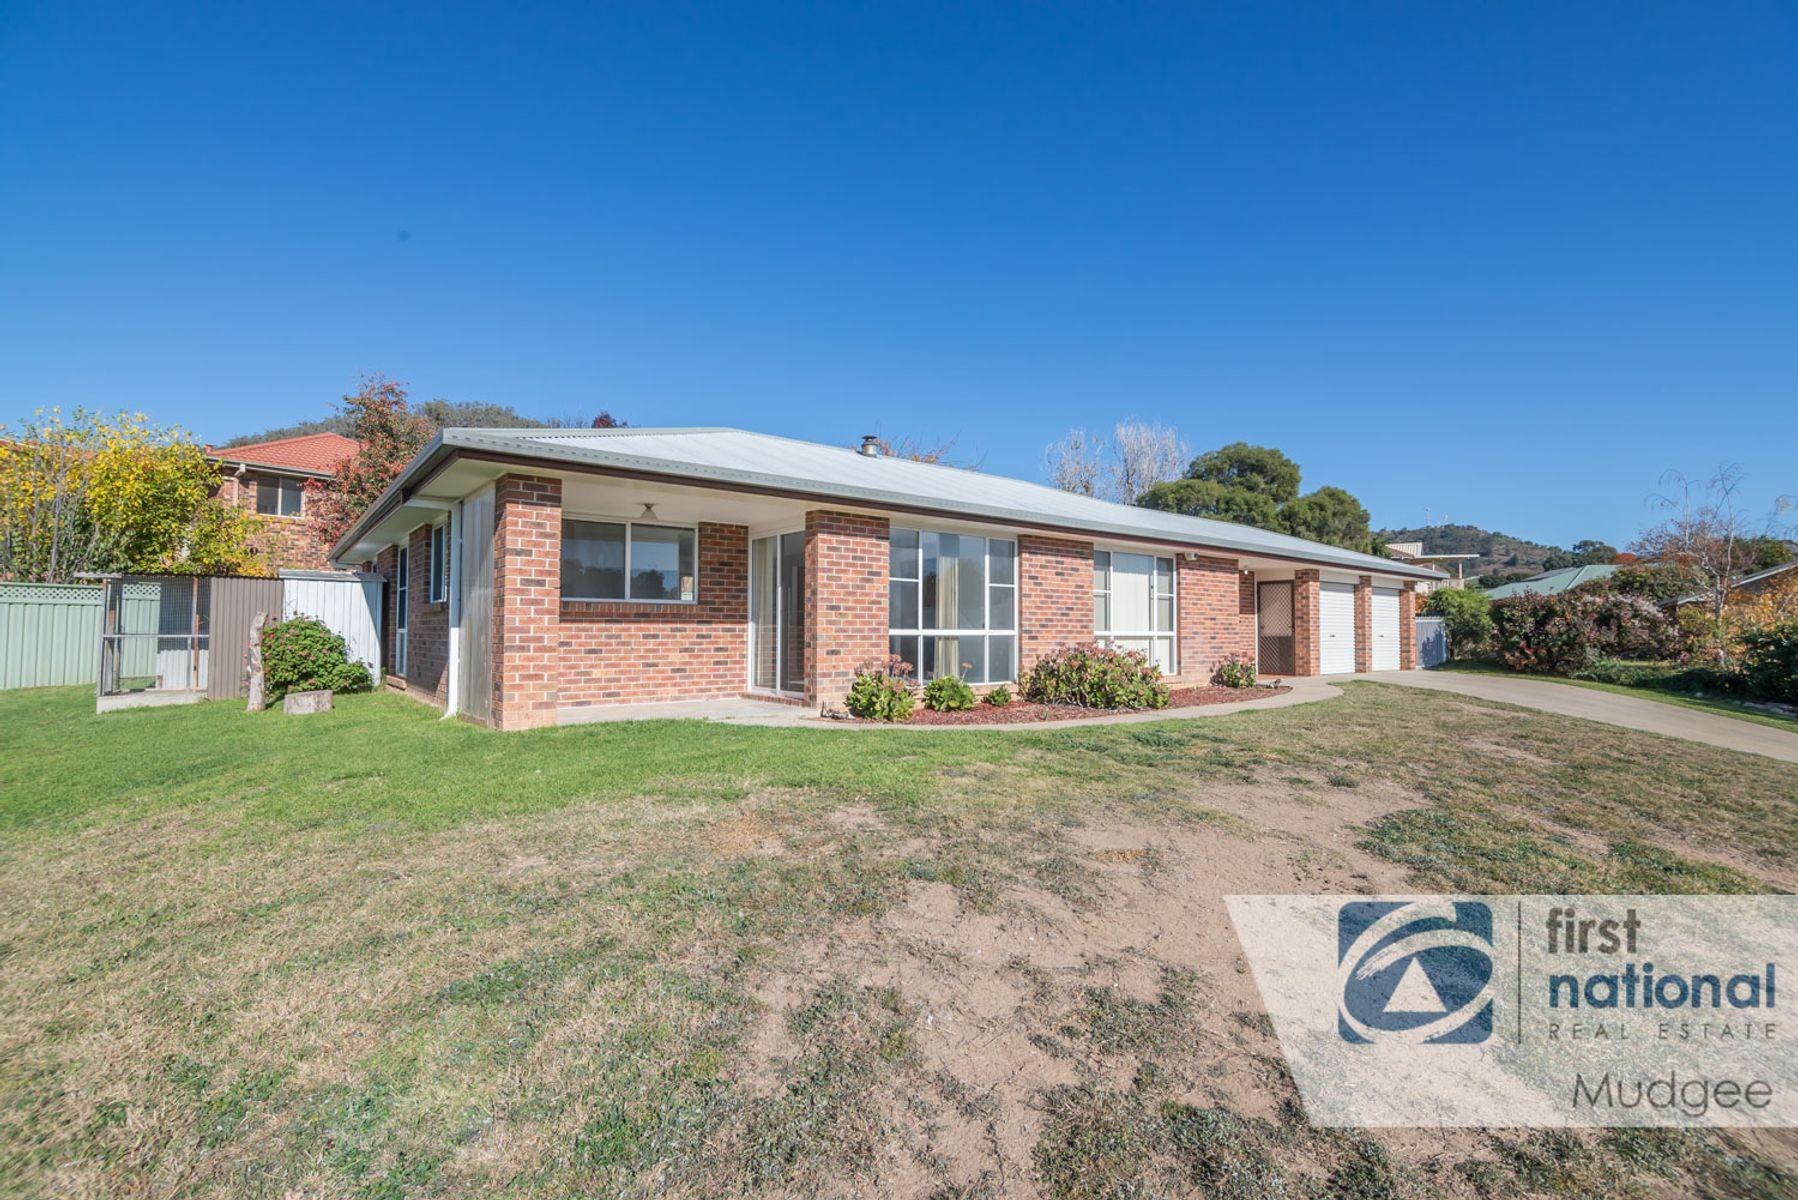 15 Lockwood Street, Mudgee, NSW 2850